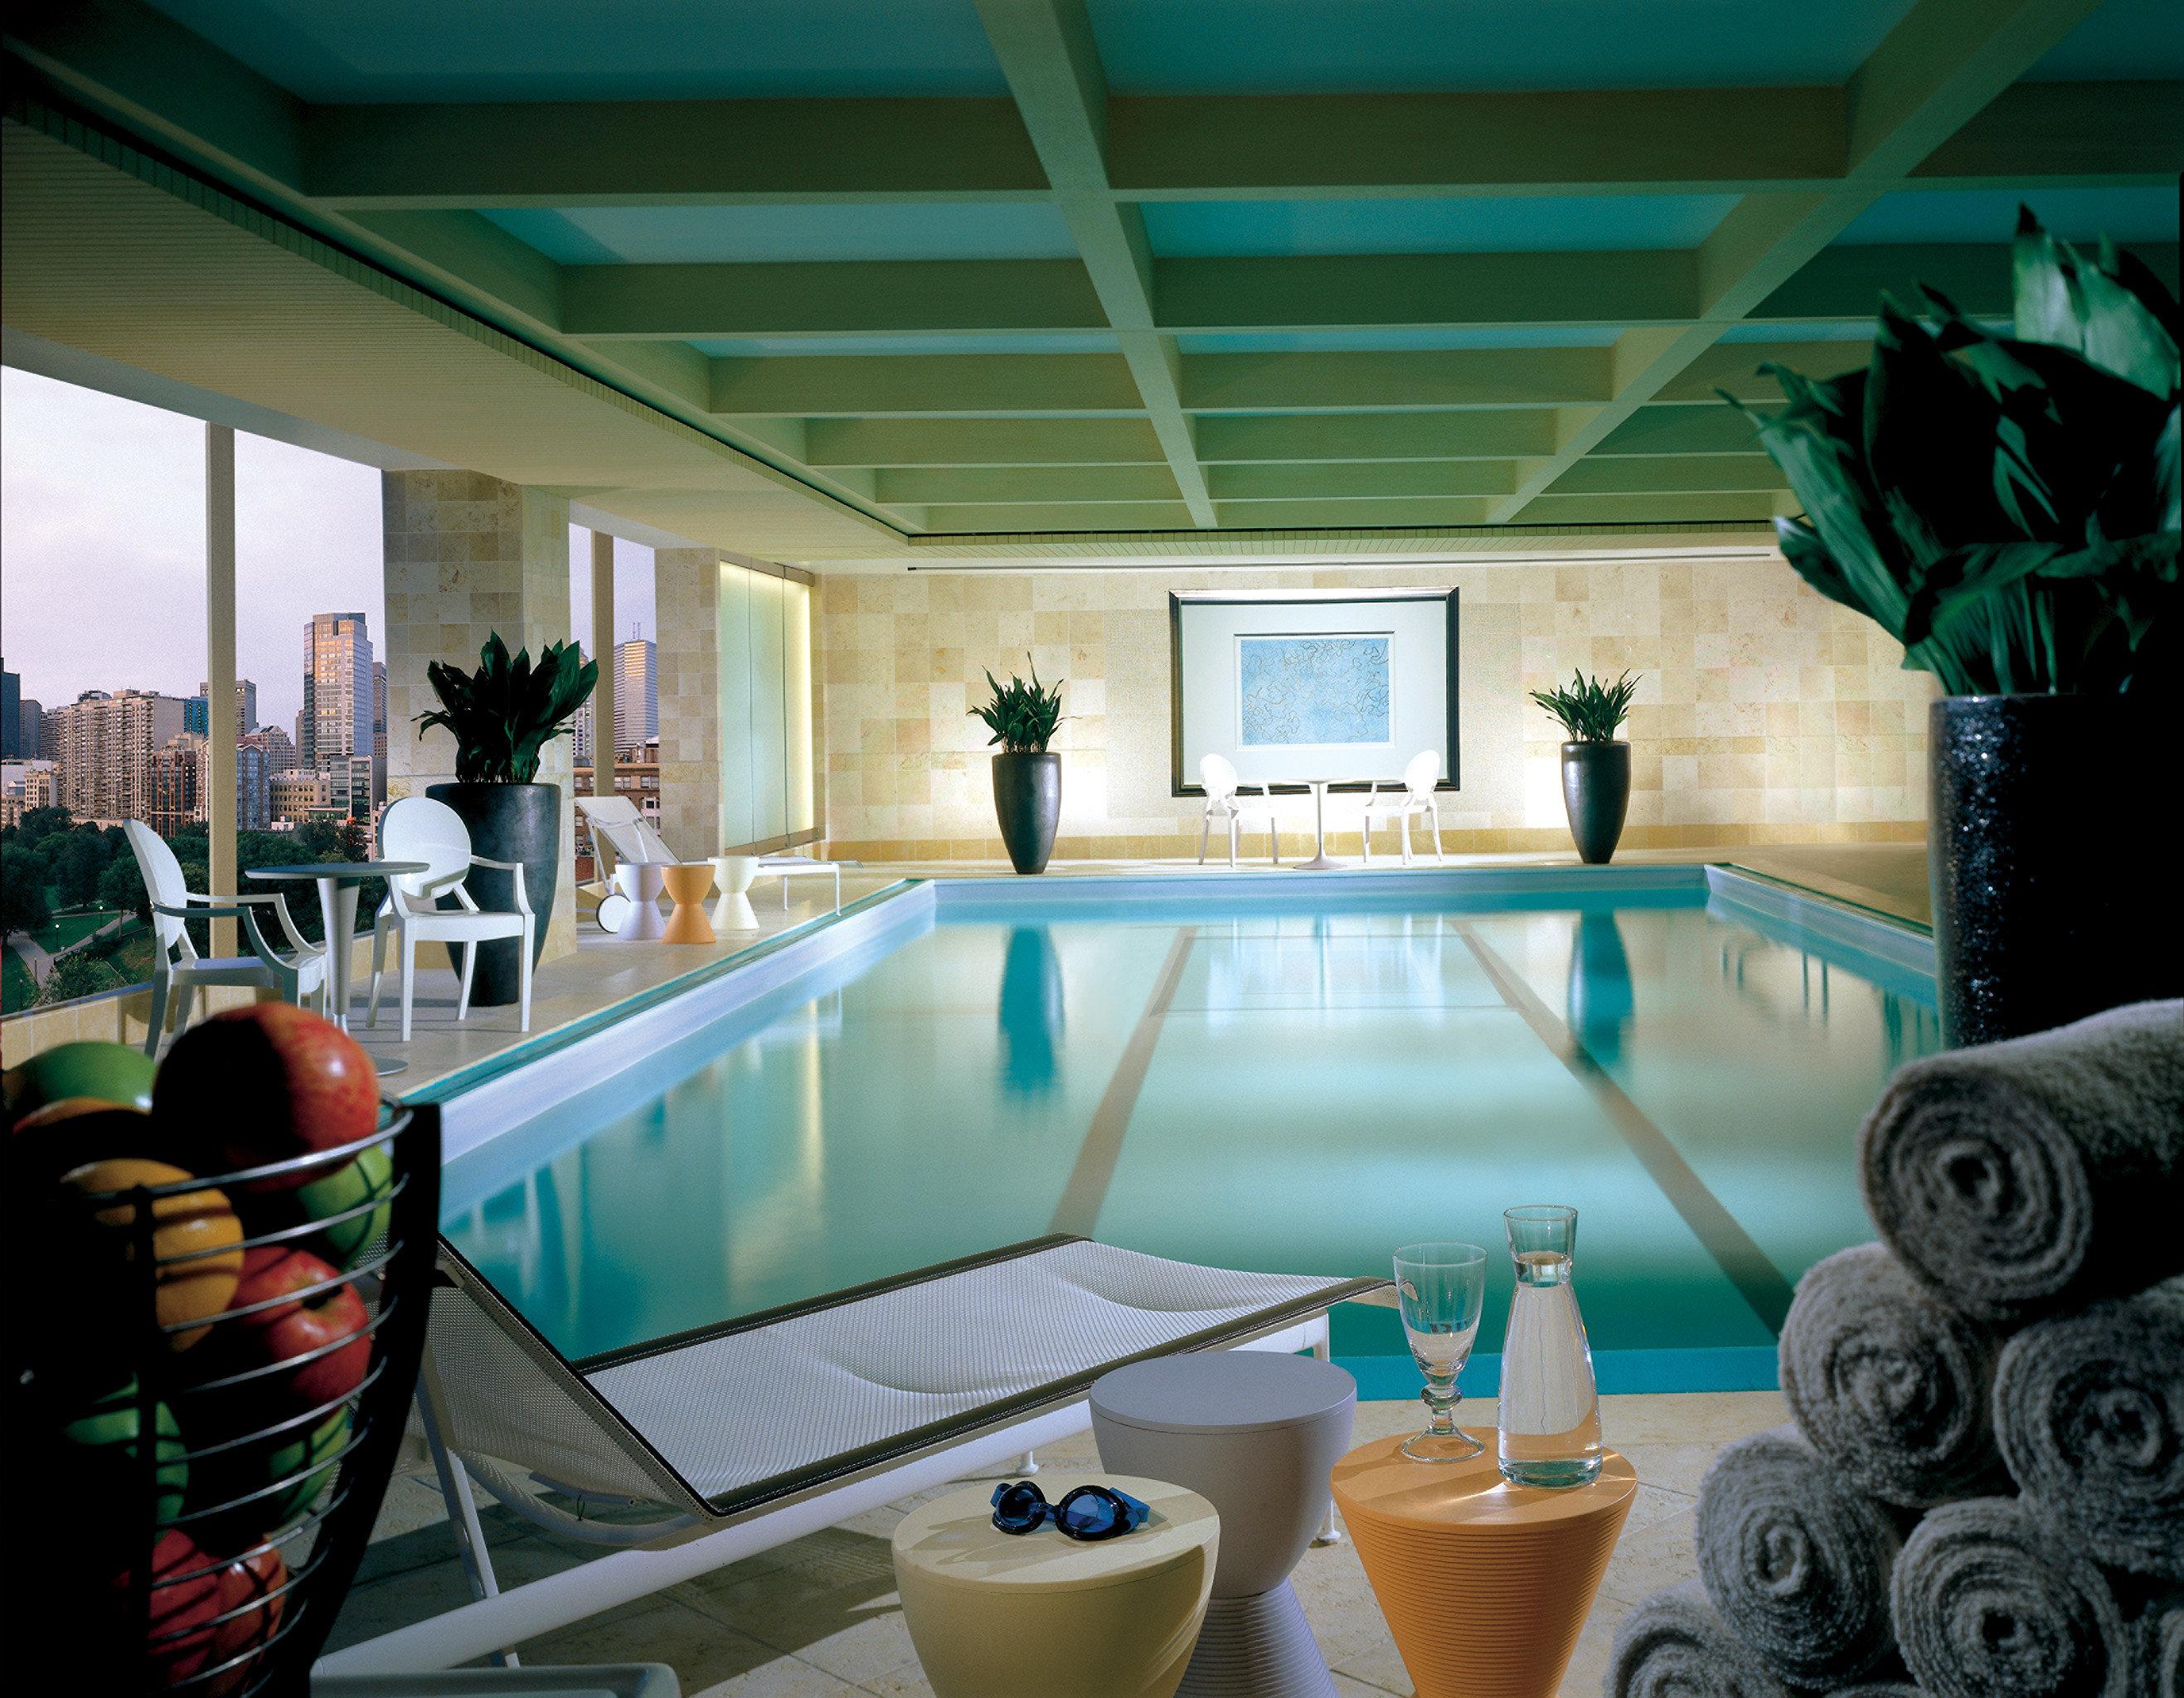 City Elegant Hotels Lounge Luxury Patio Pool Scenic views green swimming pool leisure Resort